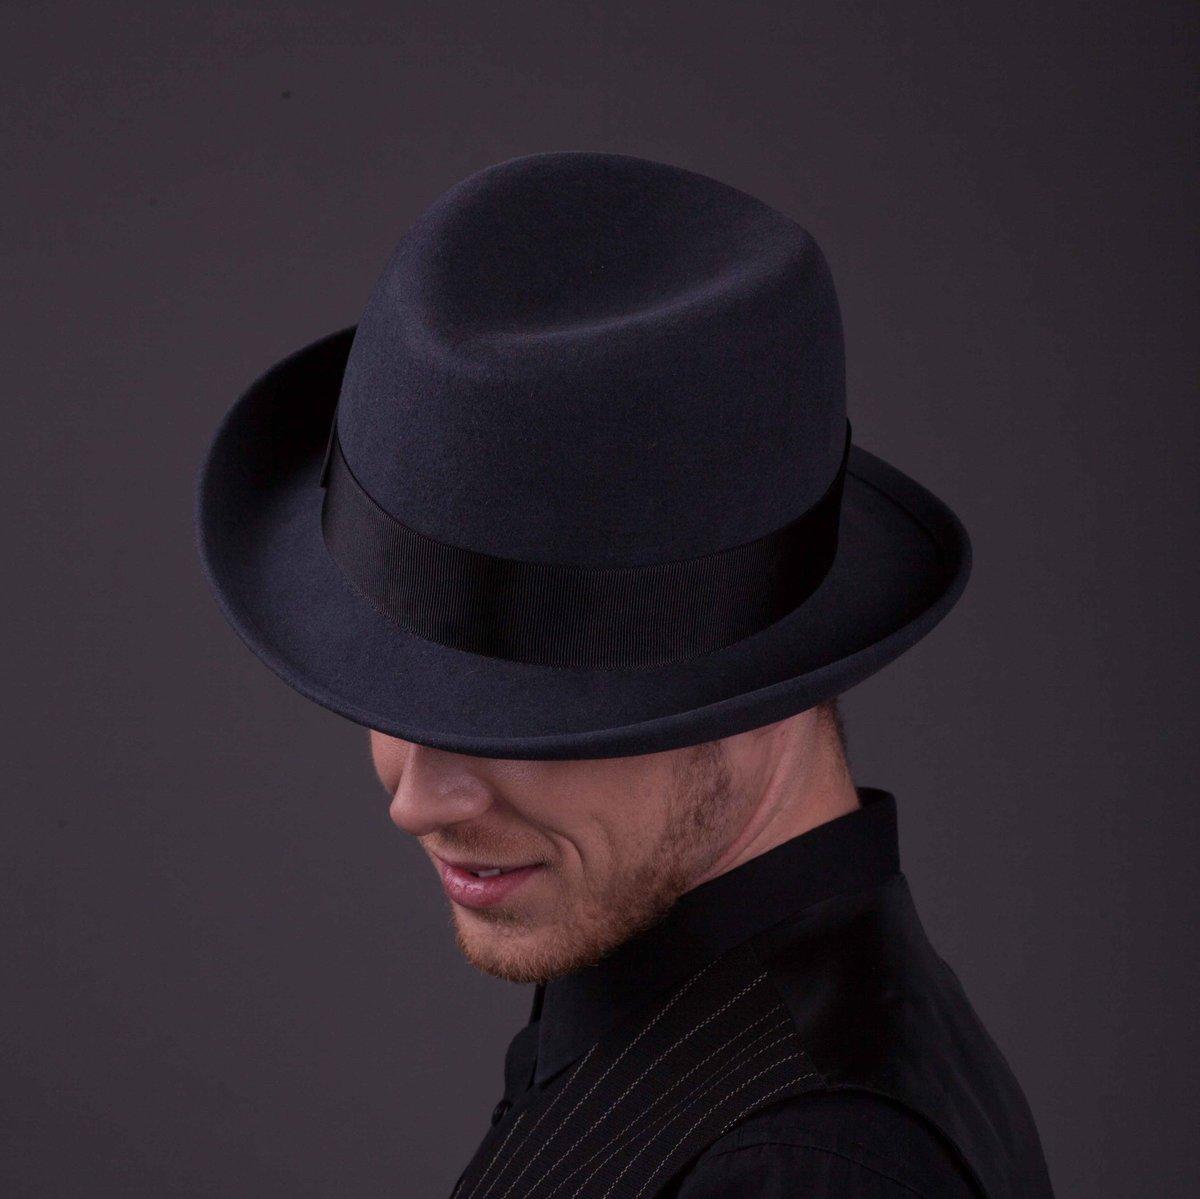 мужская шляпа картинки услуг для